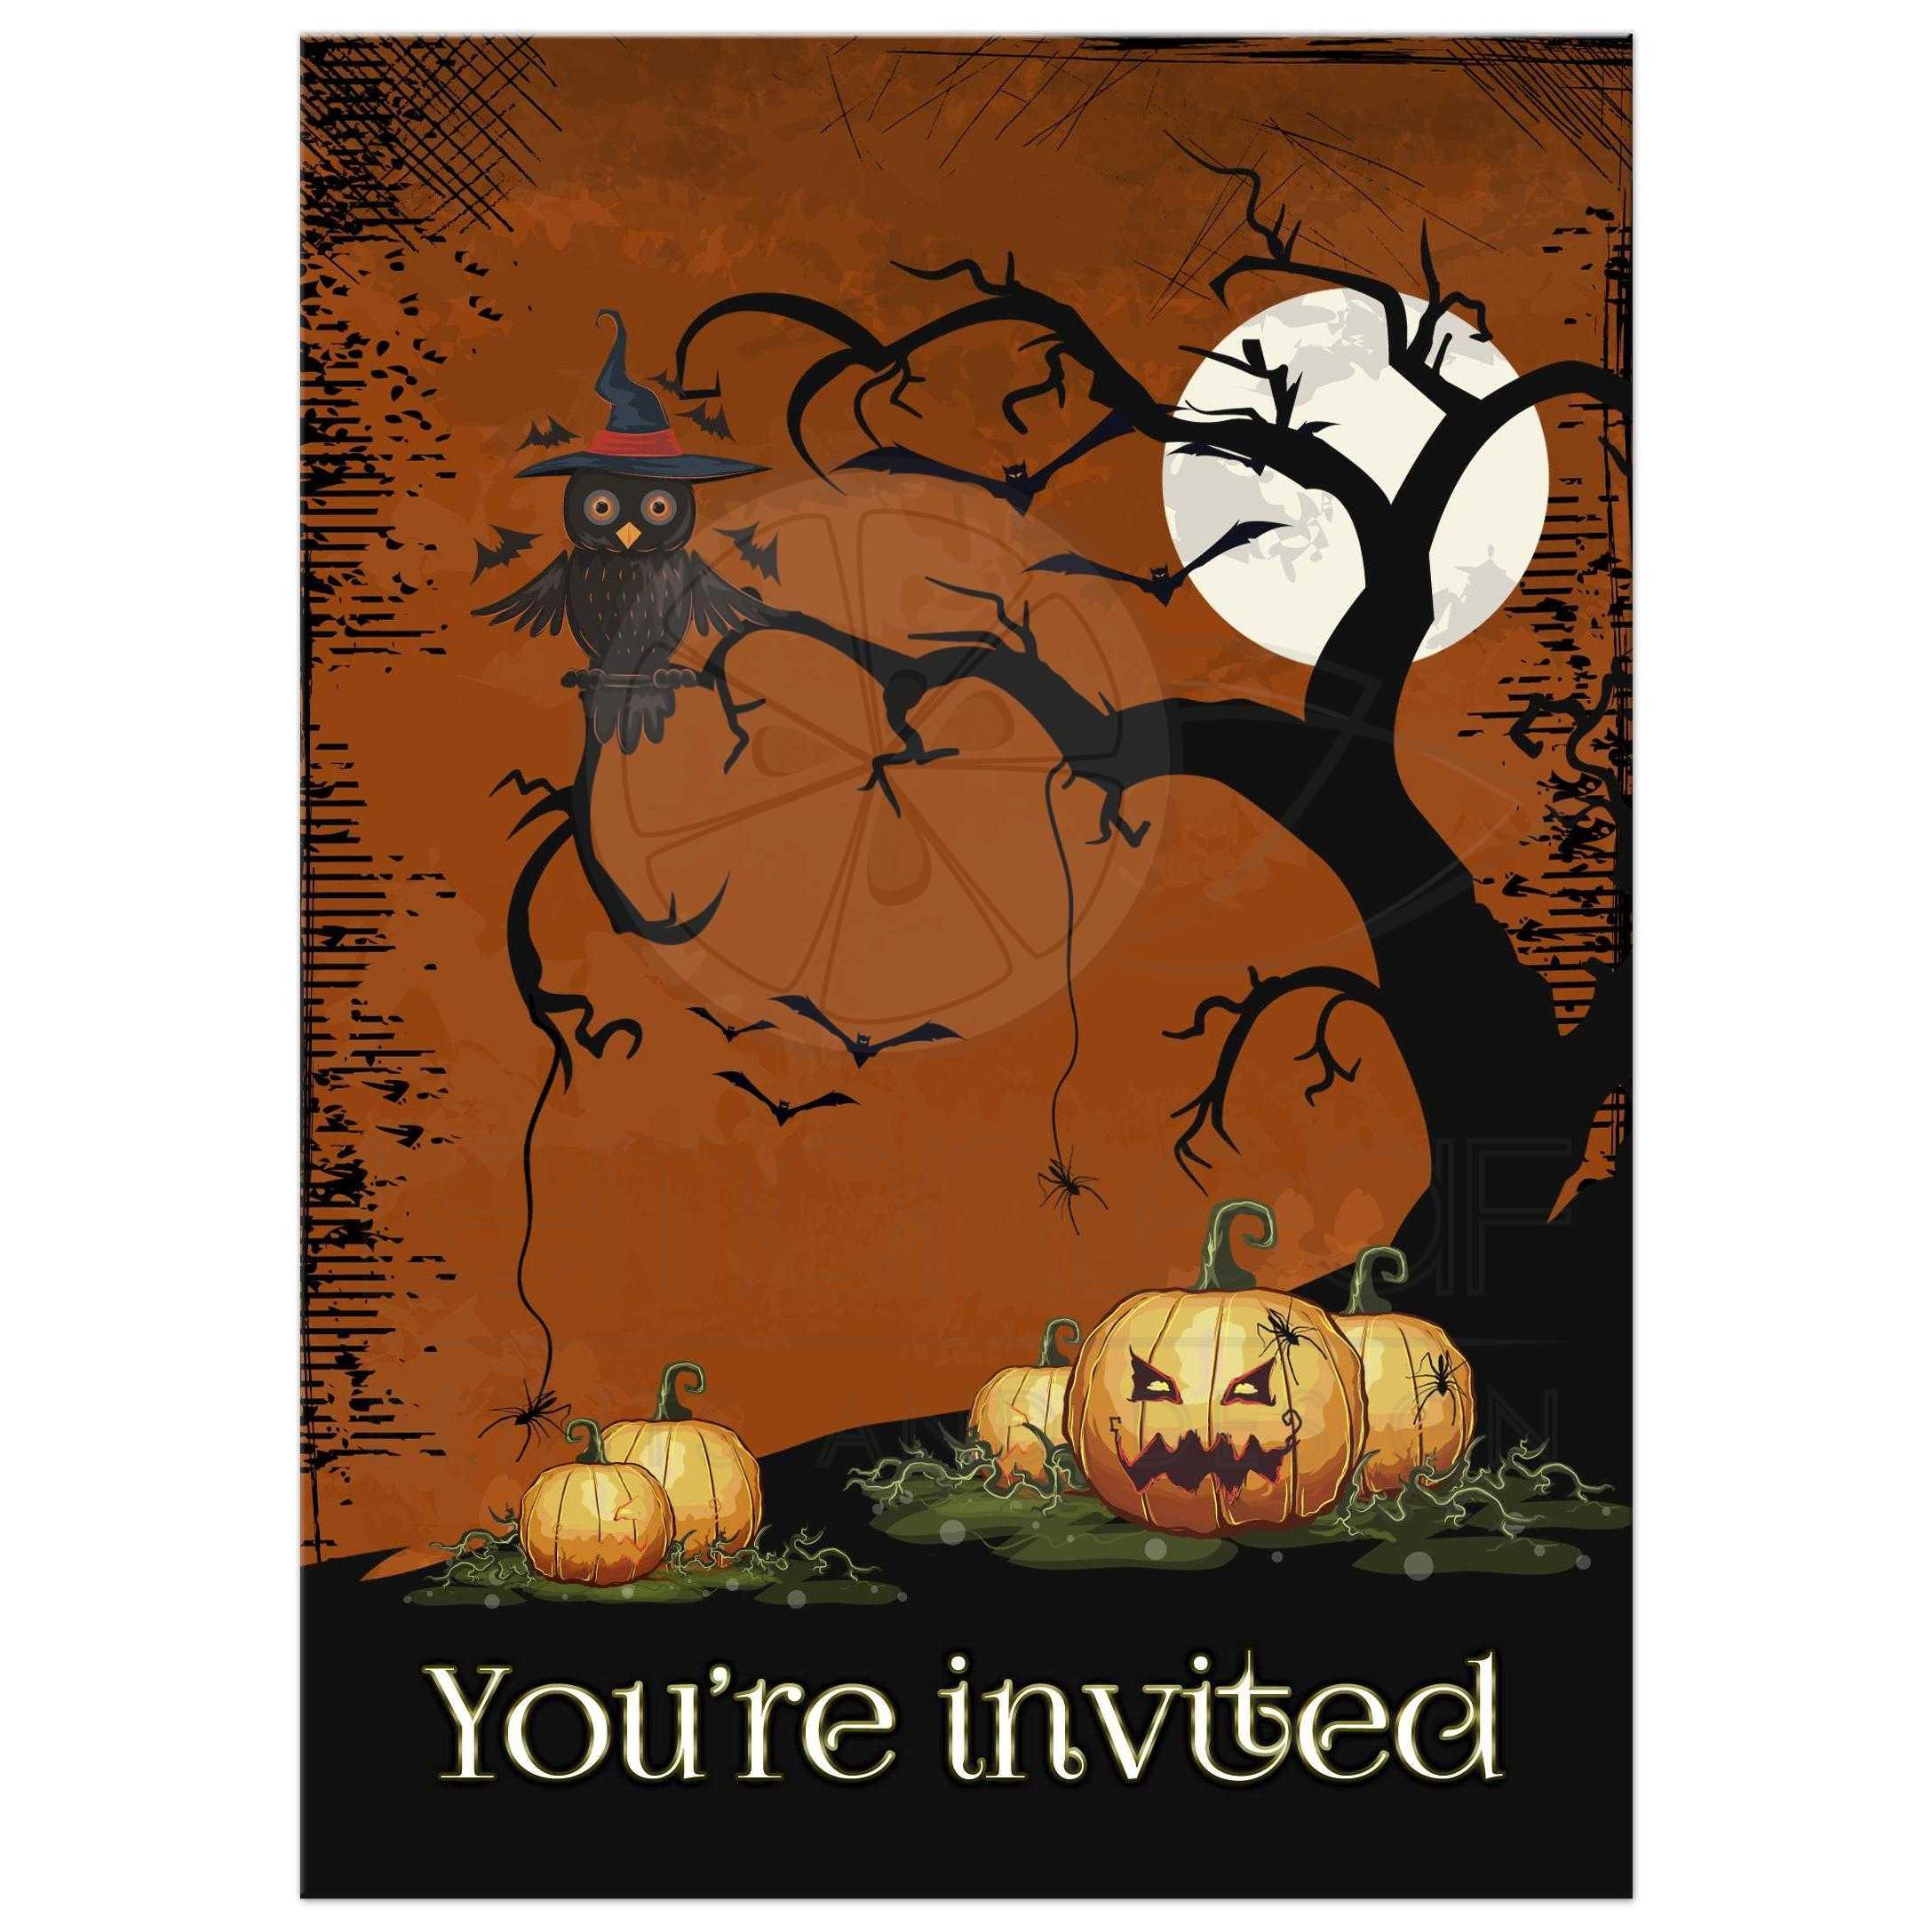 Invitation Card Christening And Birthday